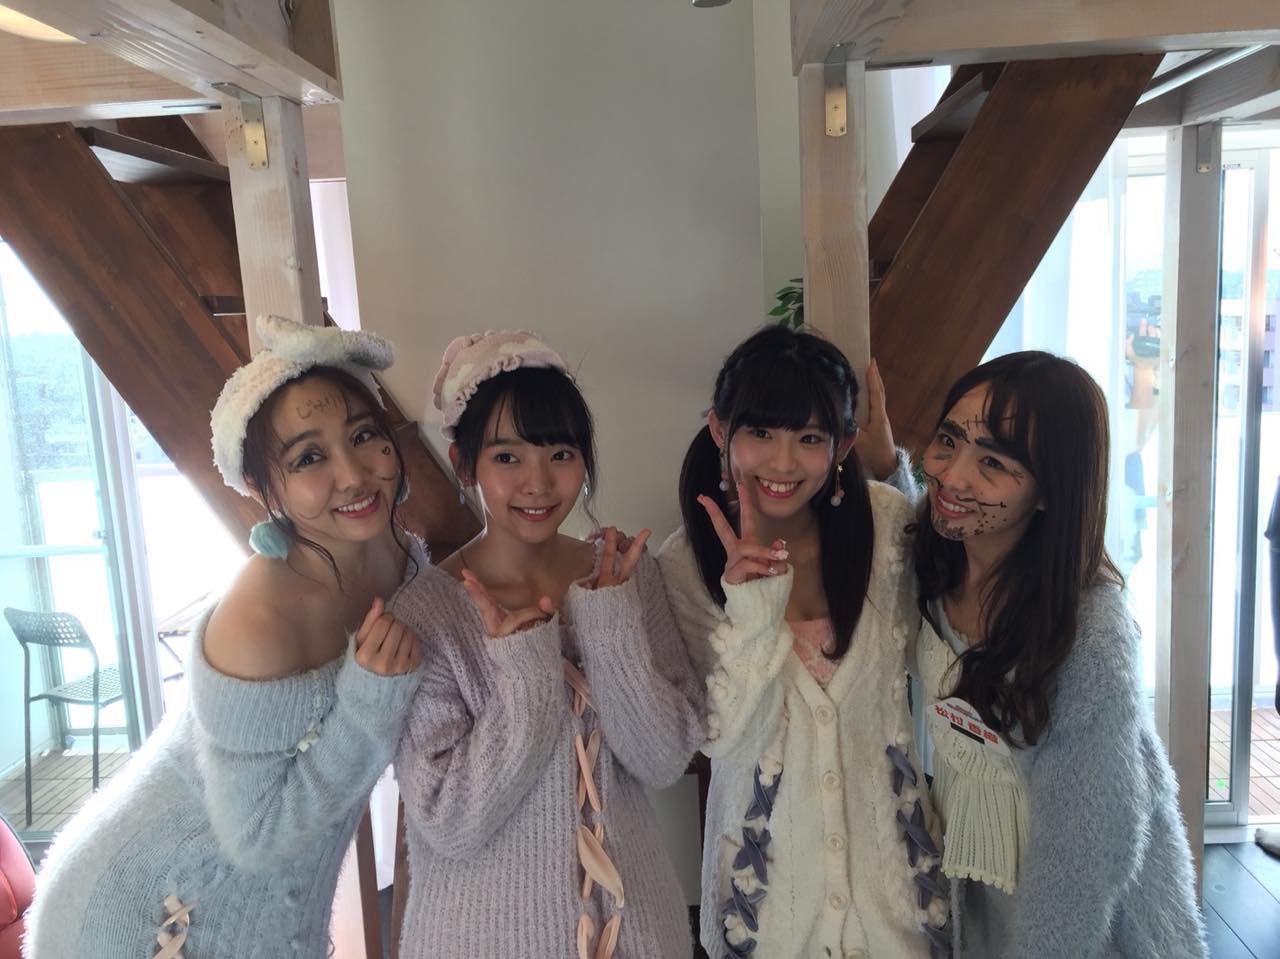 「SKE48 むすびのイチバン!」名古屋市内のアイドルにピッタリな物件巡り! [11/13 24:25~]